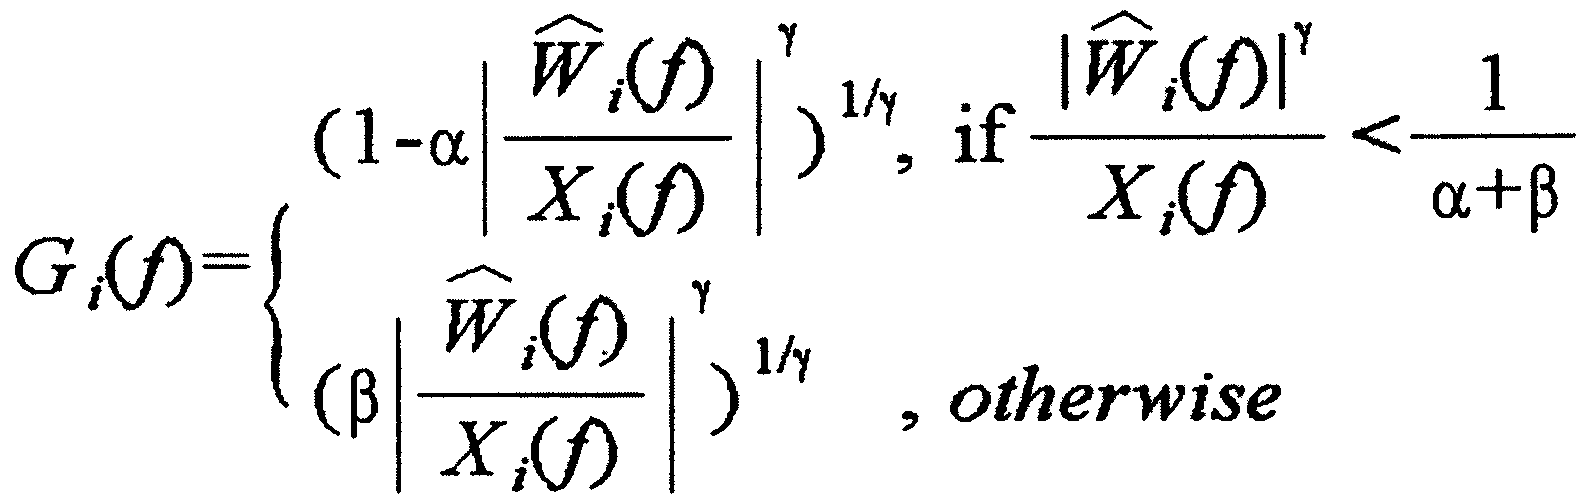 Figure WO-DOC-51